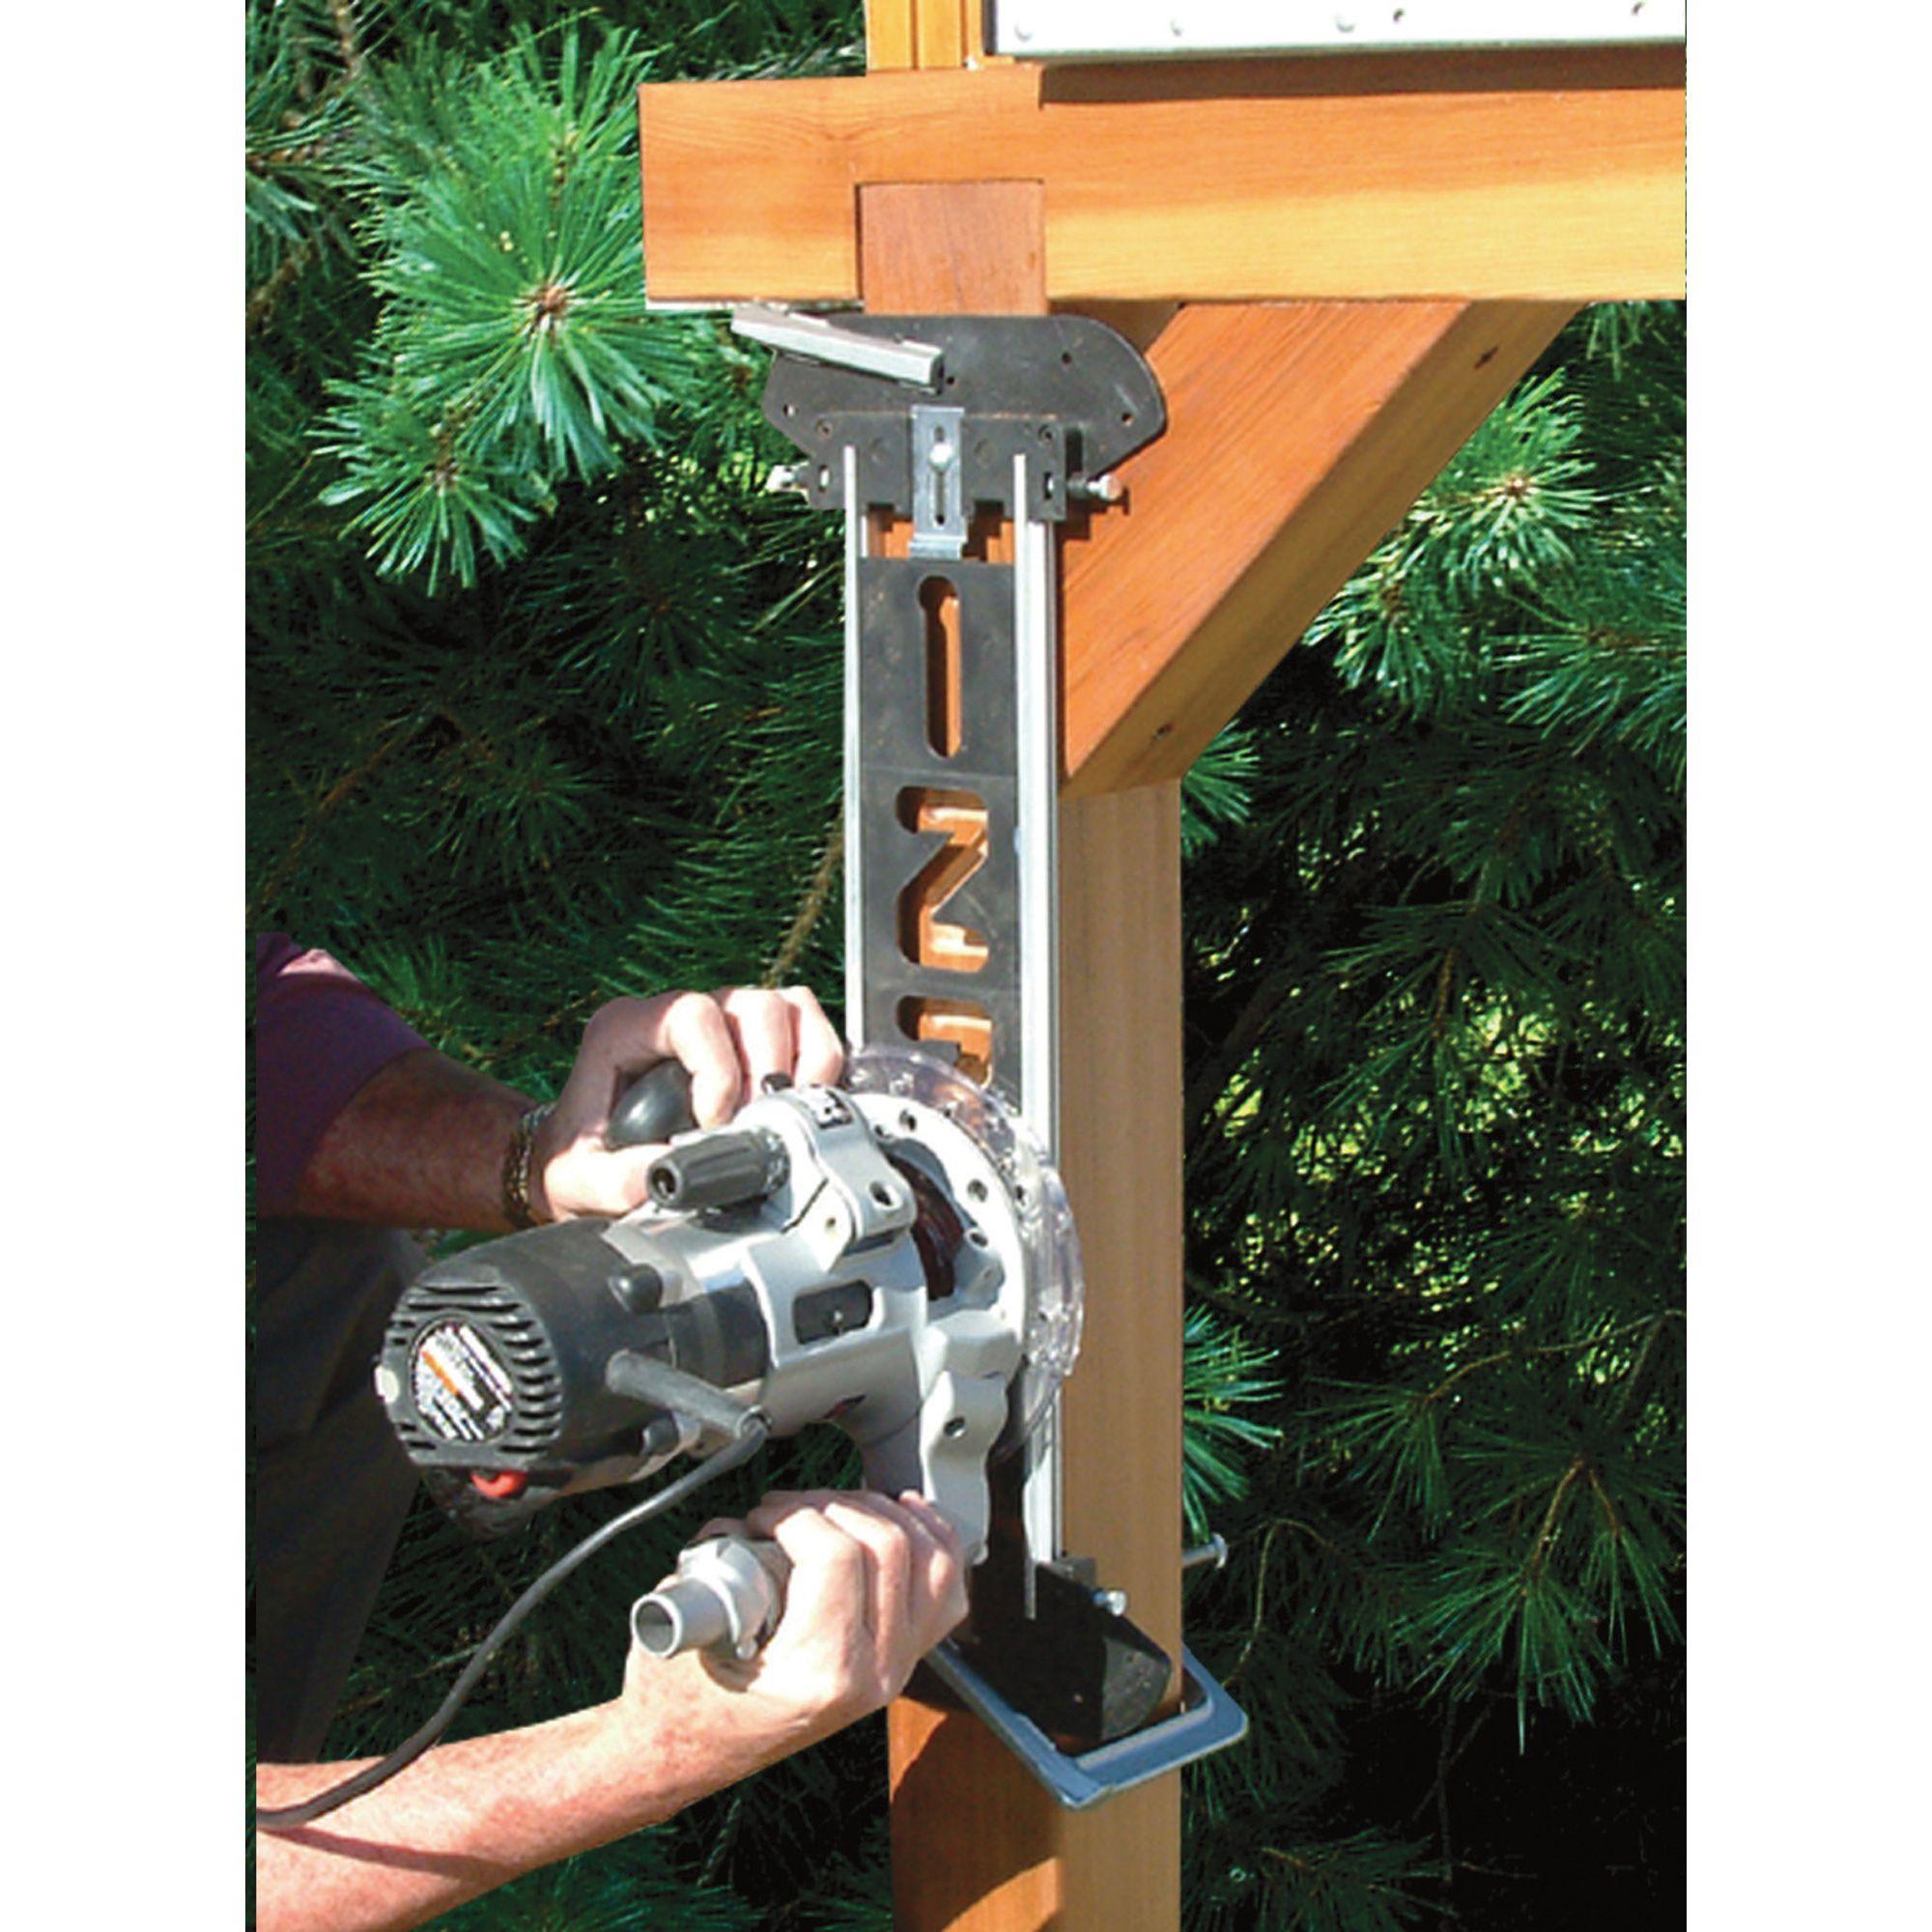 milescraft signpro sign making system model 1212 woodworking